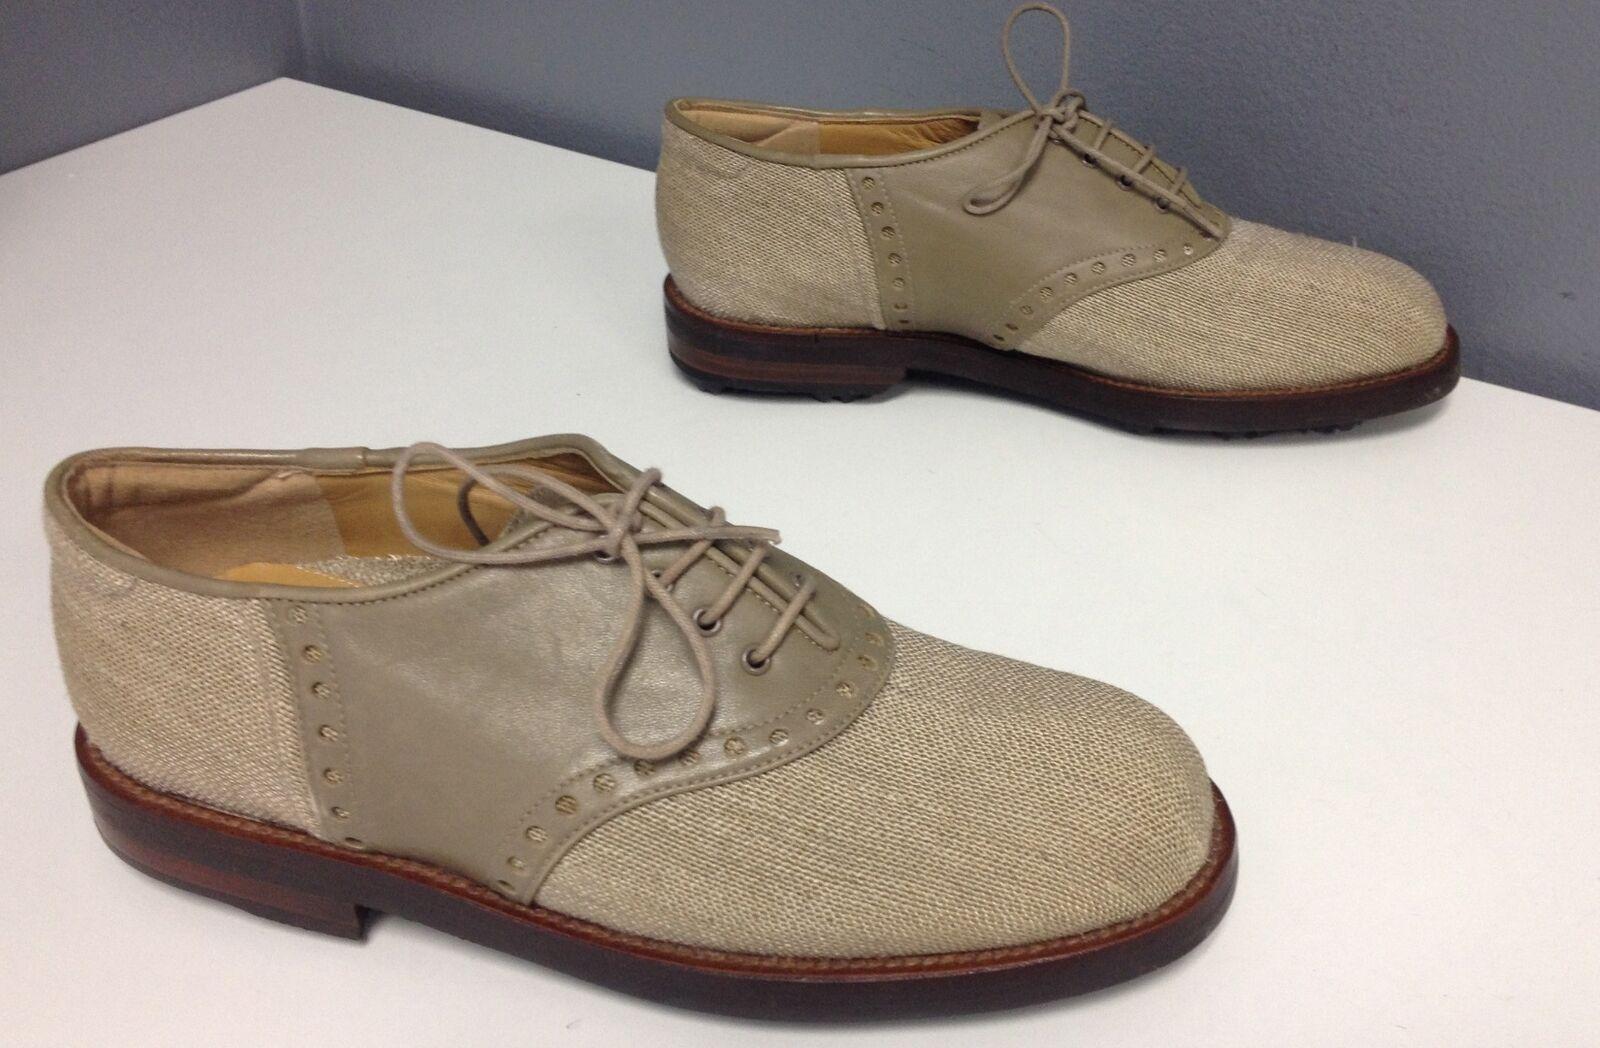 STUART WEITZMAN Beige Linen Perforated Leather Trim Lace Up Cleats Sz 5 B4384